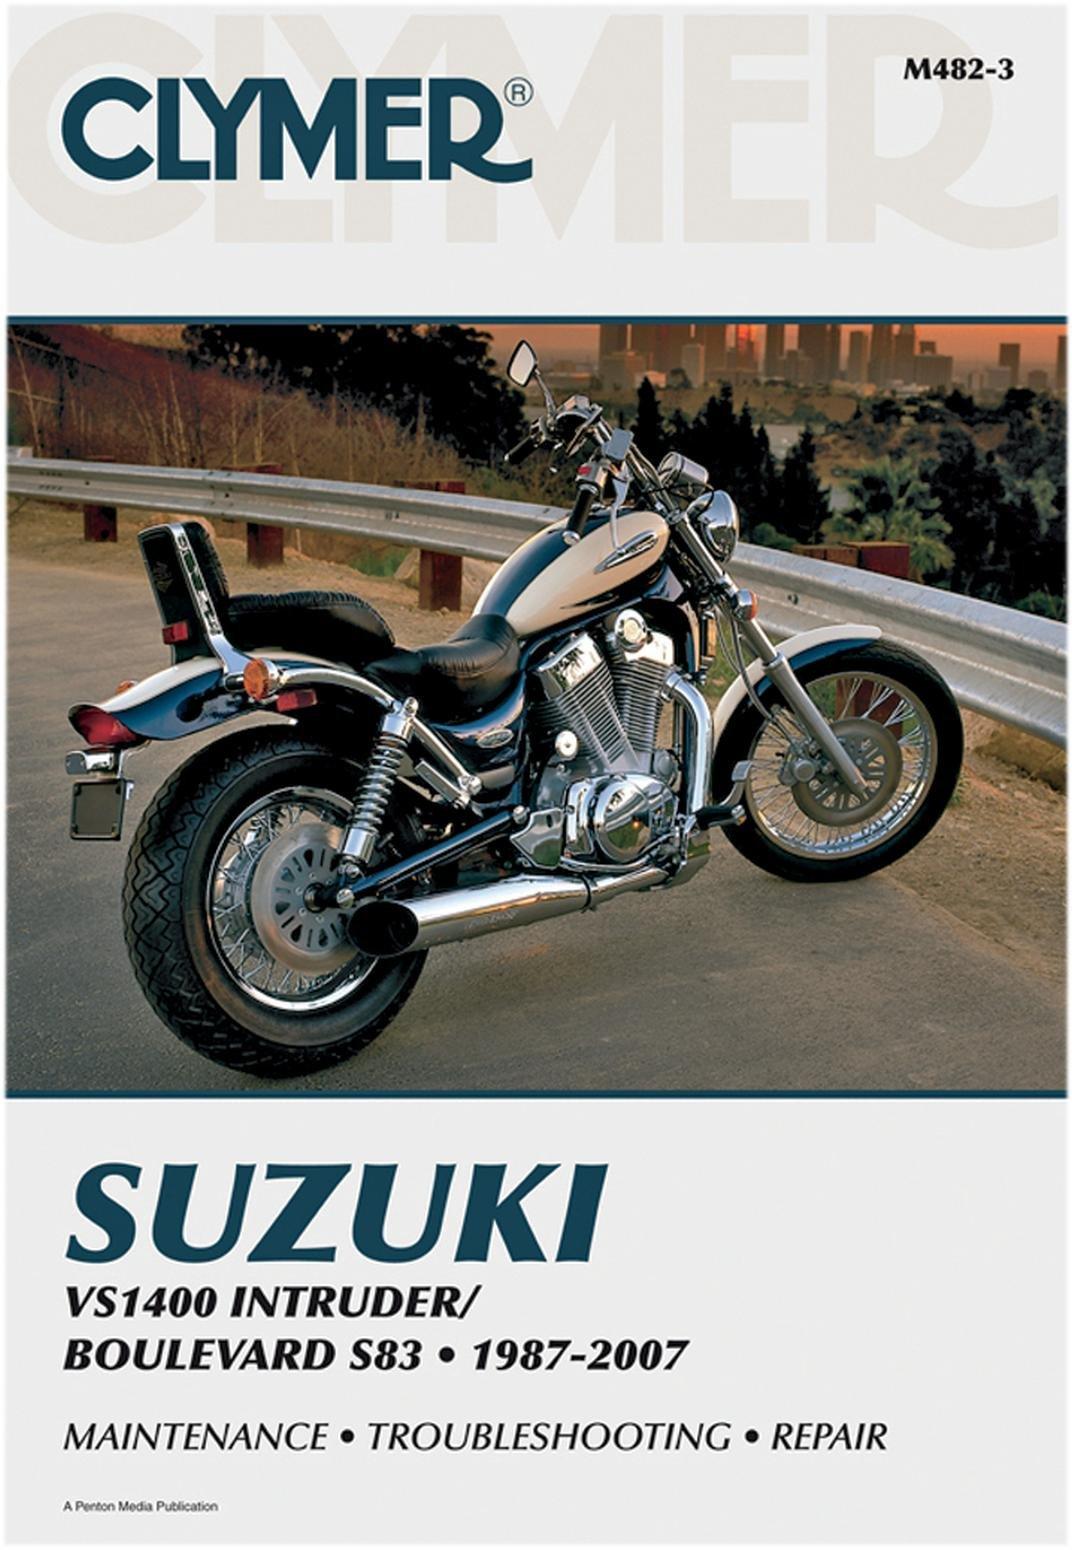 Clymer Repair Manual for Suzuki VS1400 Intruder 87-07 by Clymer (Image #1)